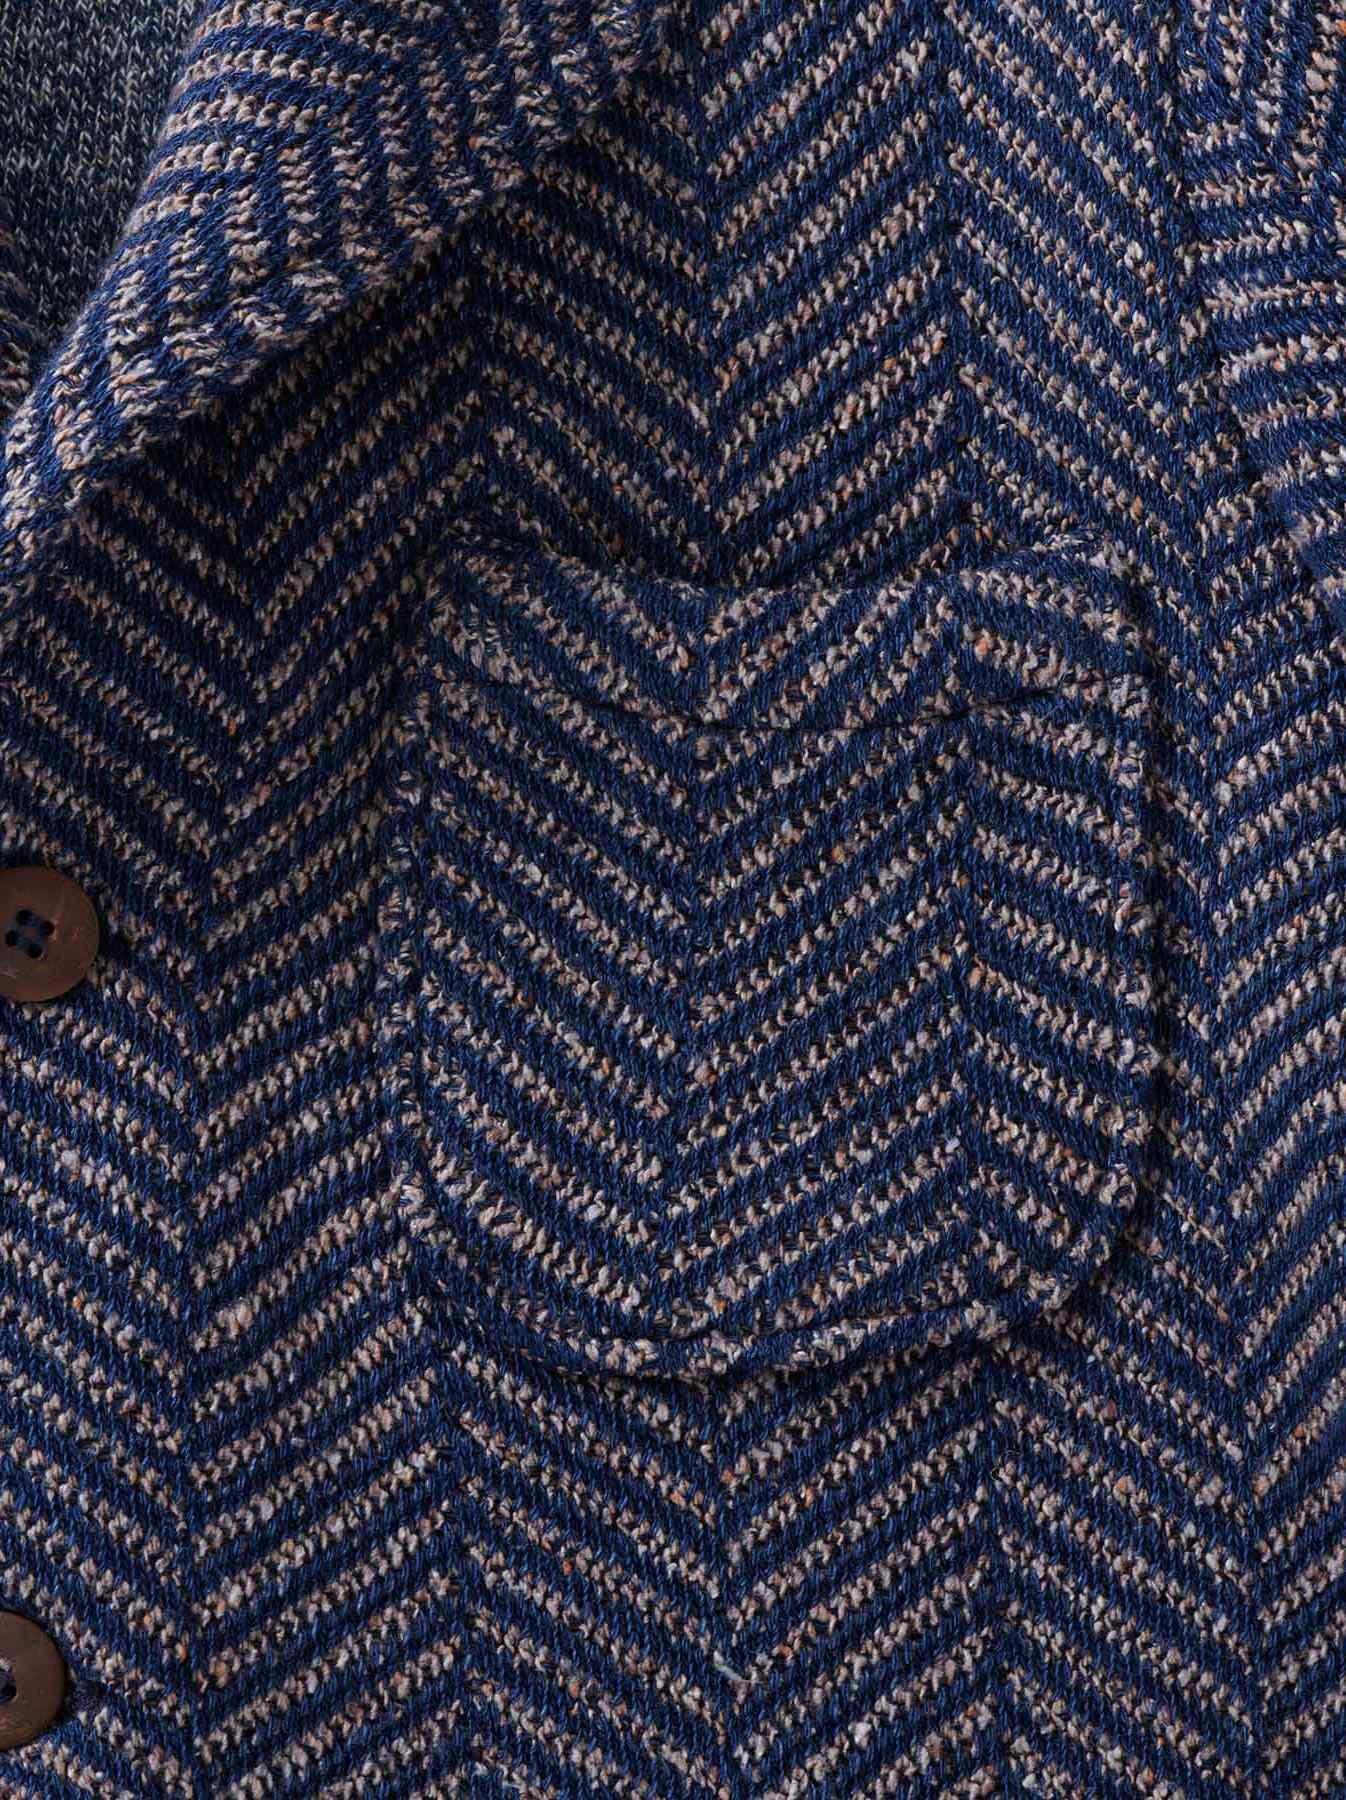 Indigo Cotton Tweed Knit Jacket-8